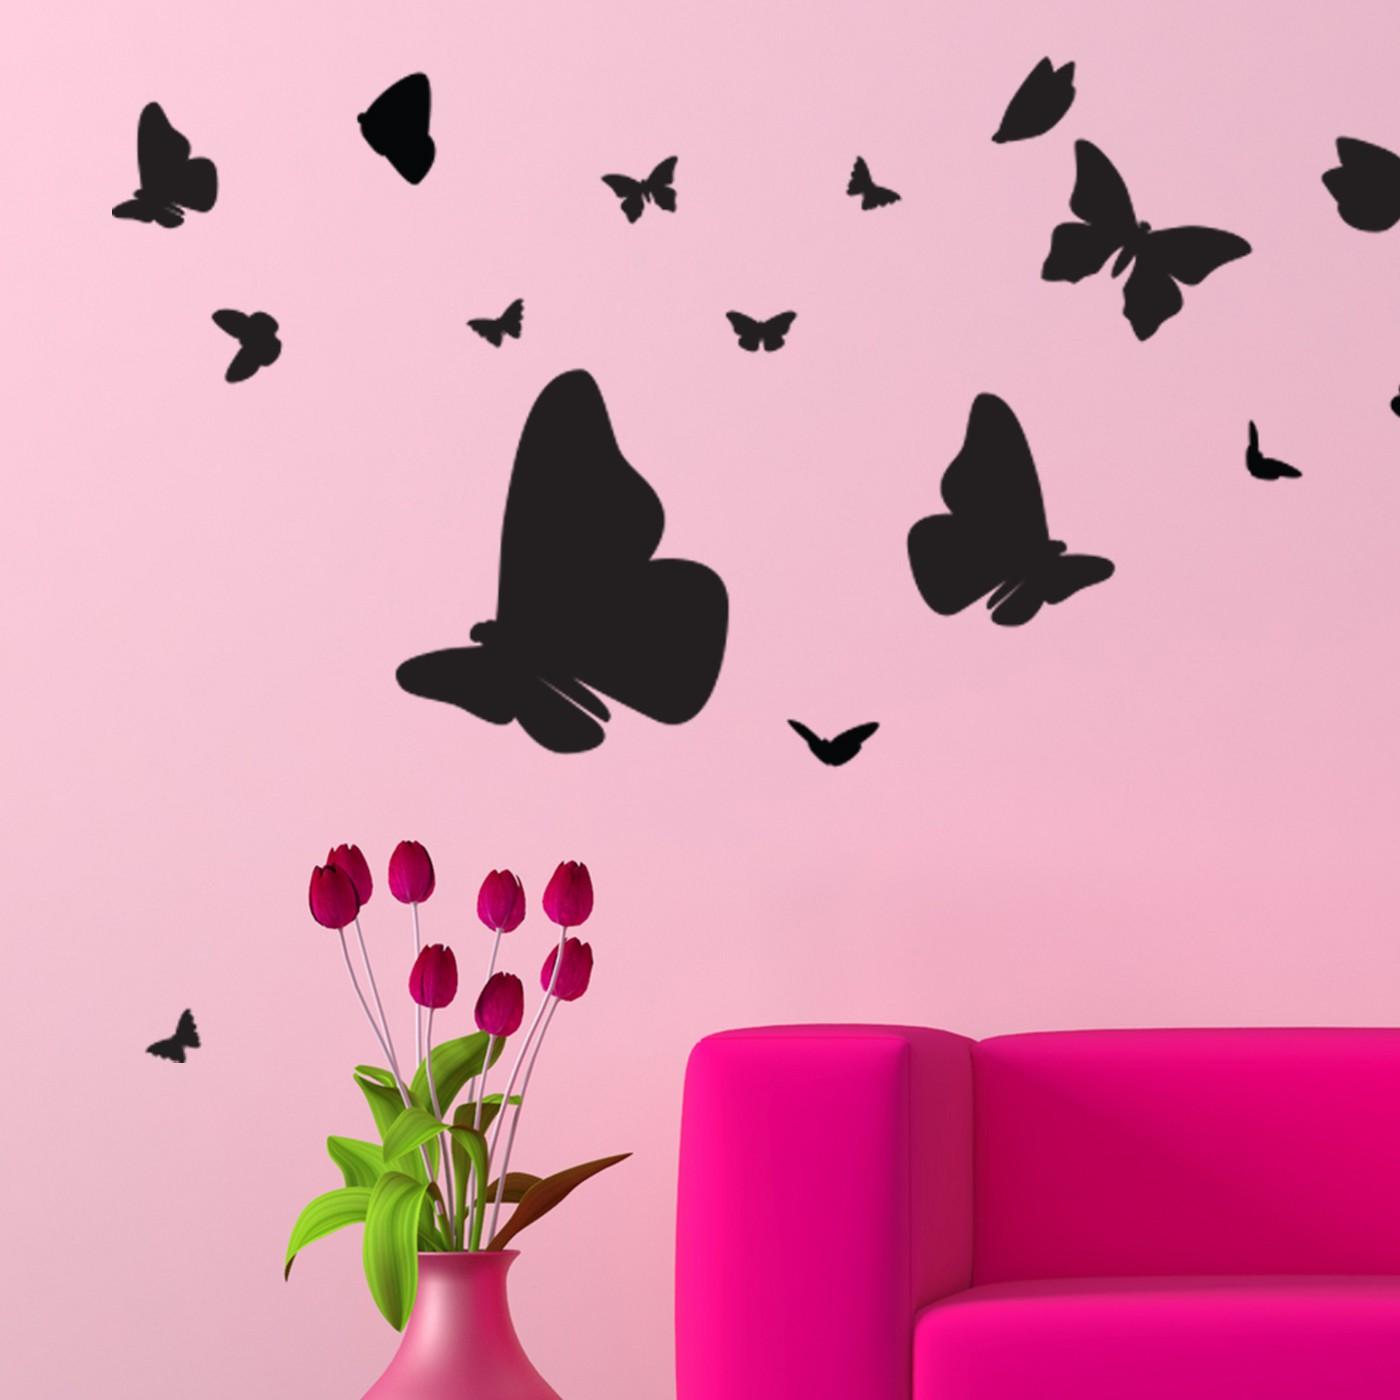 Sticker swarm of butterflies cheap Stickers Children discount